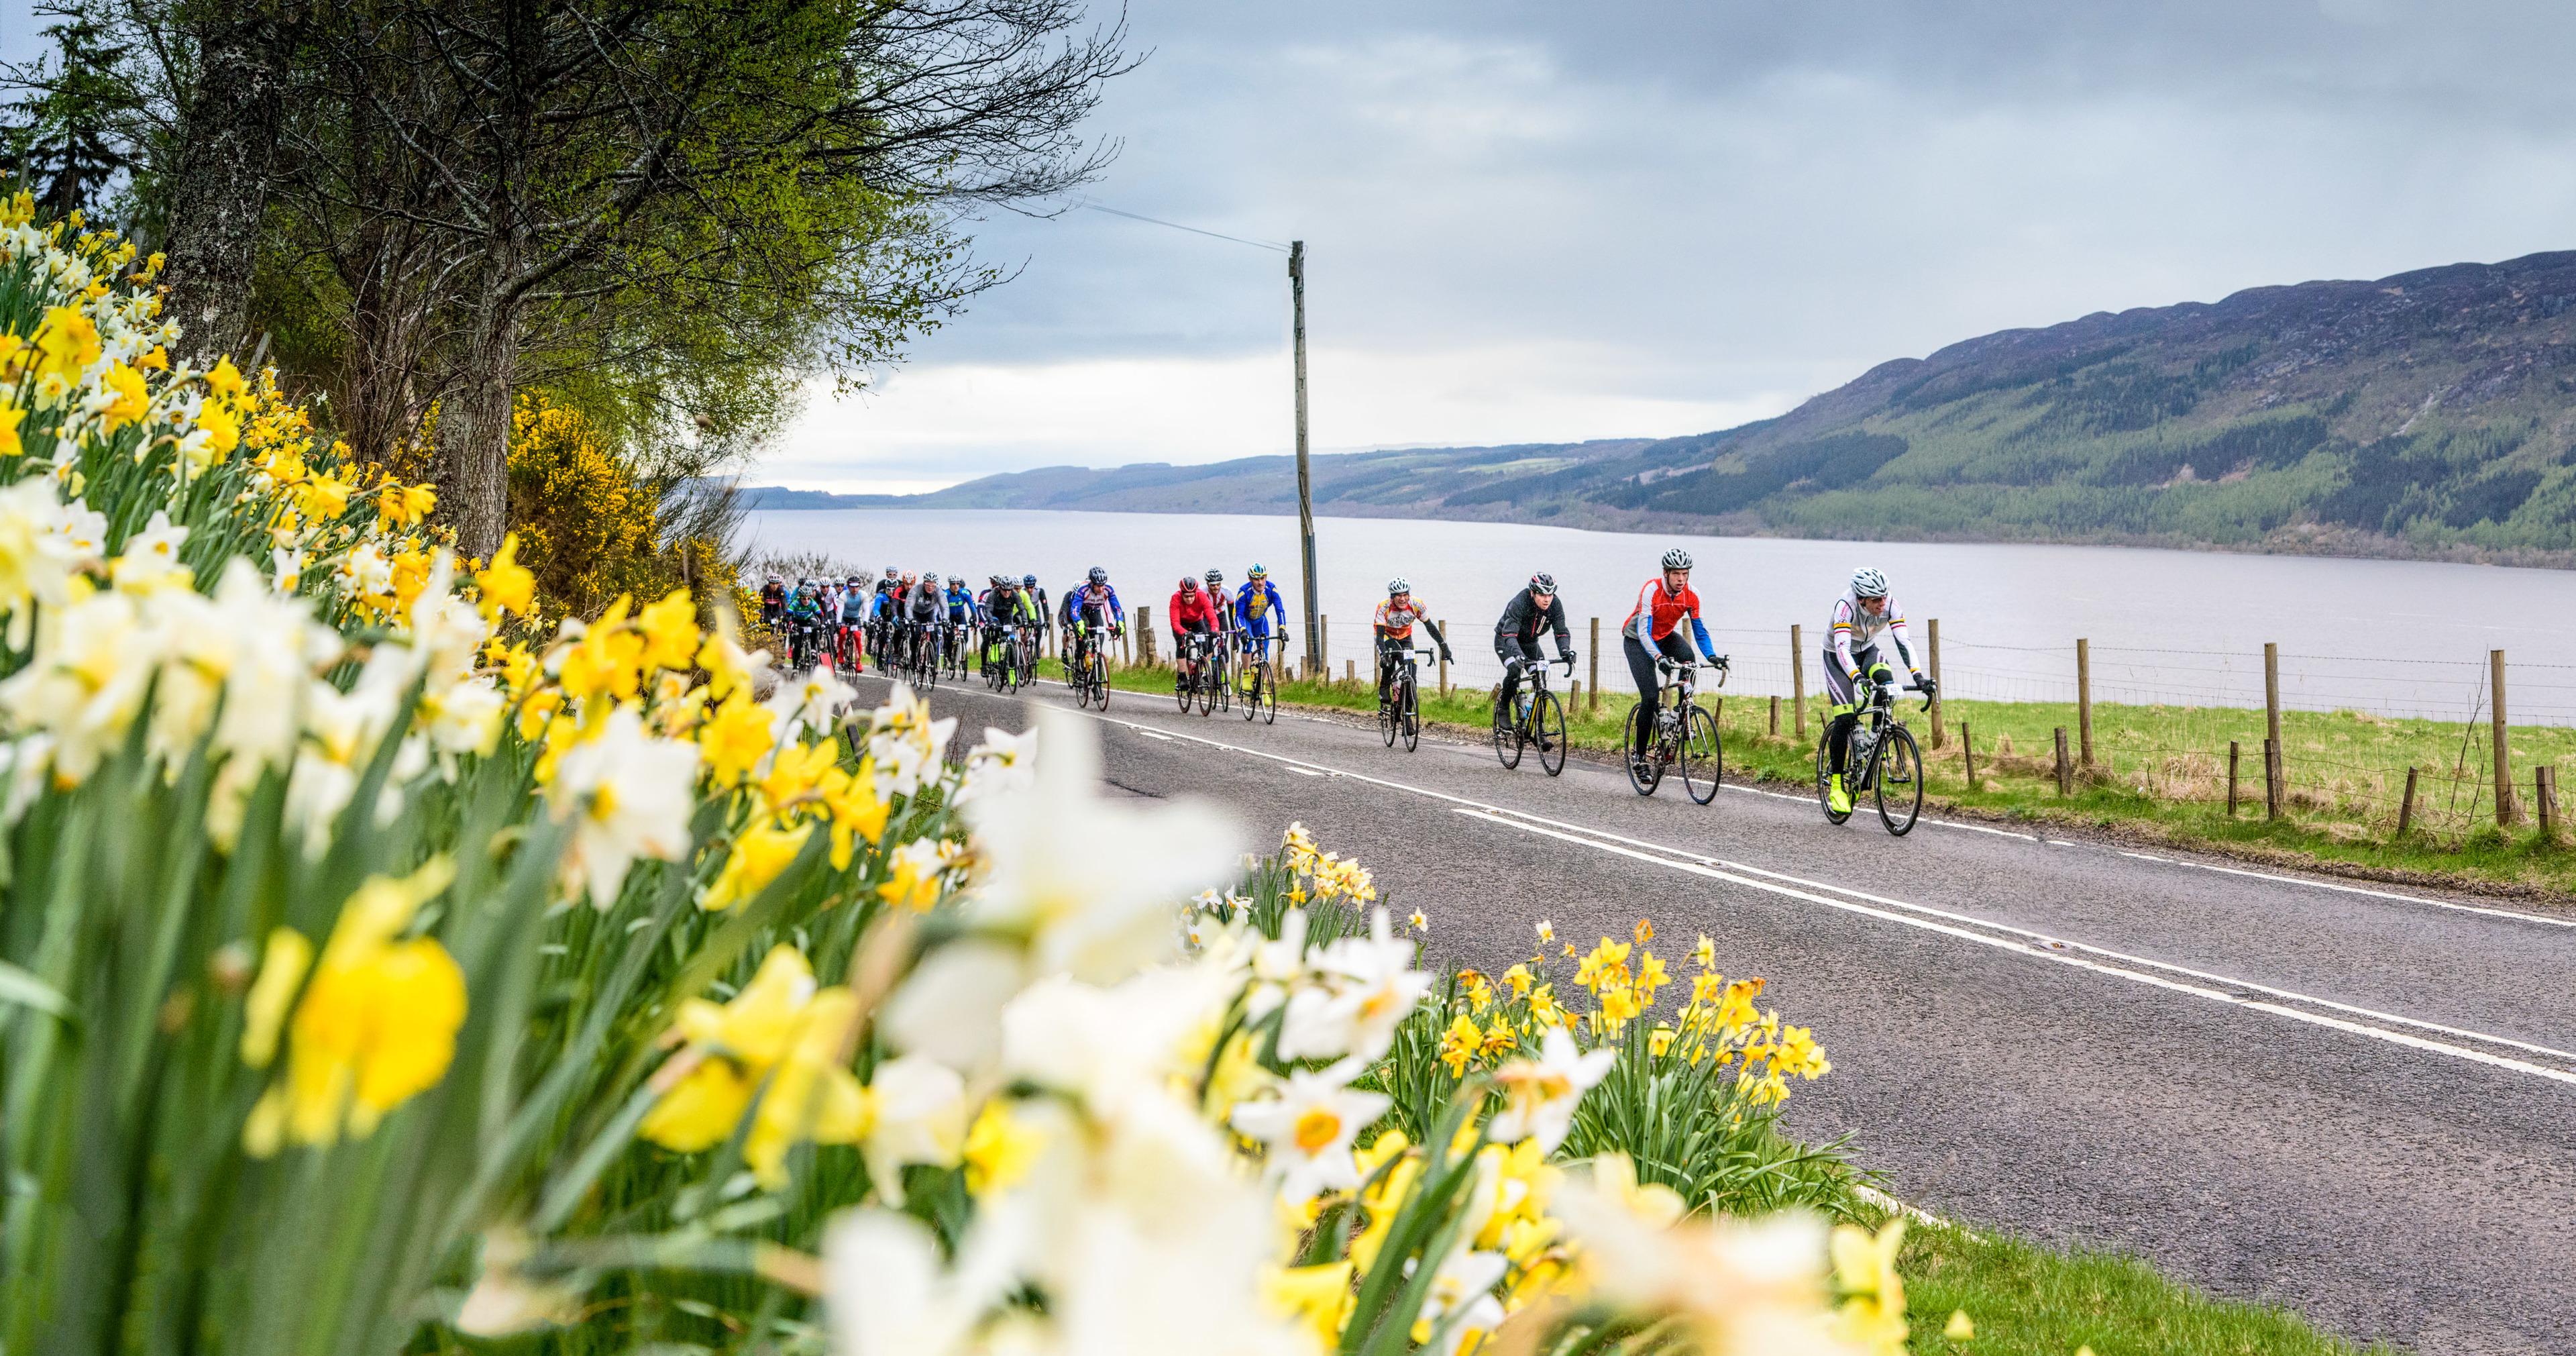 Last year's Etape Loch Ness event.